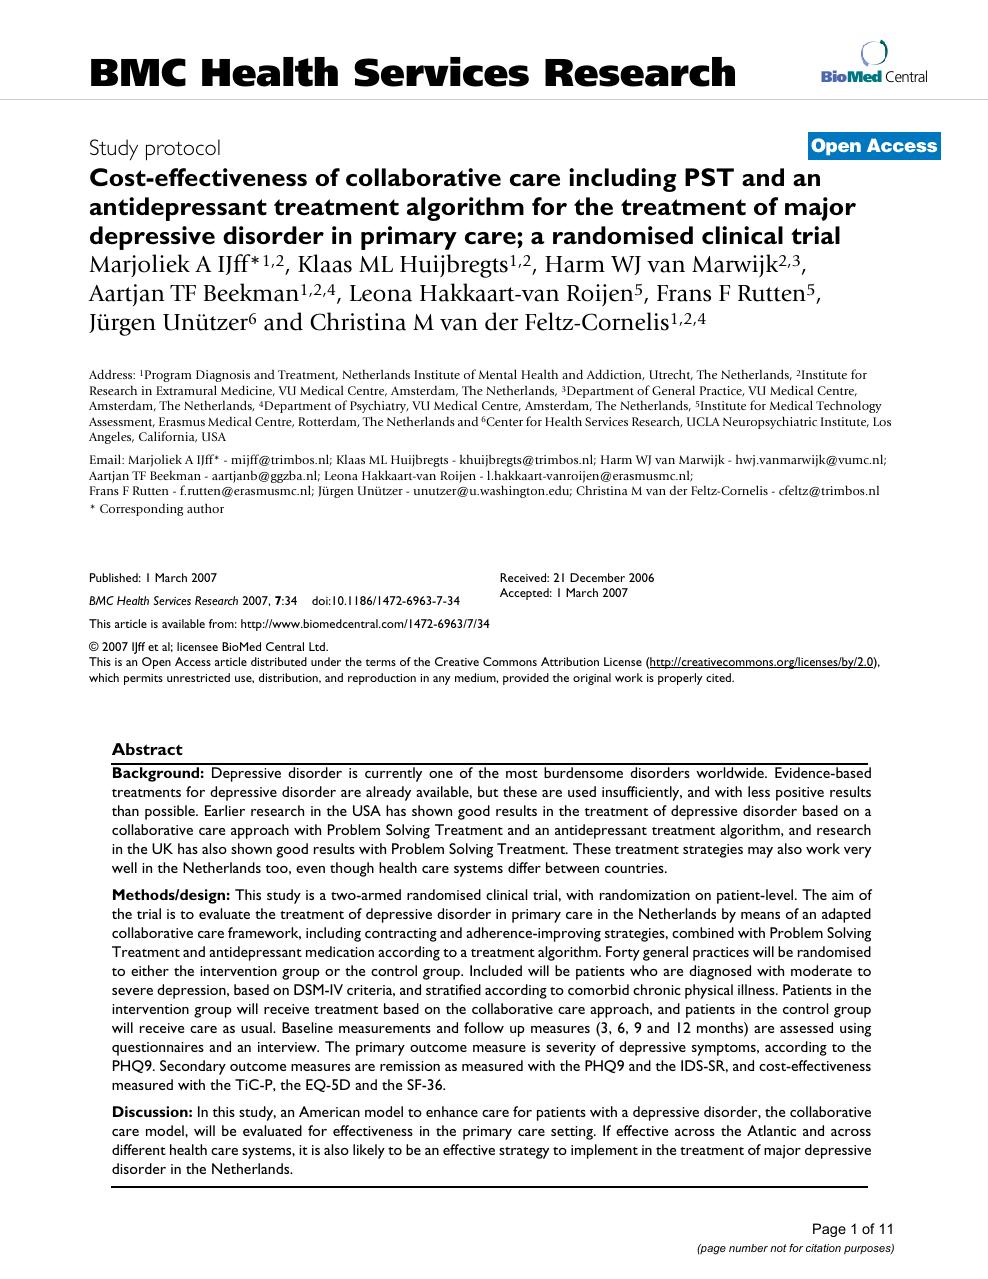 multidisciplinaire richtlijn depressie en diabetes mellitus